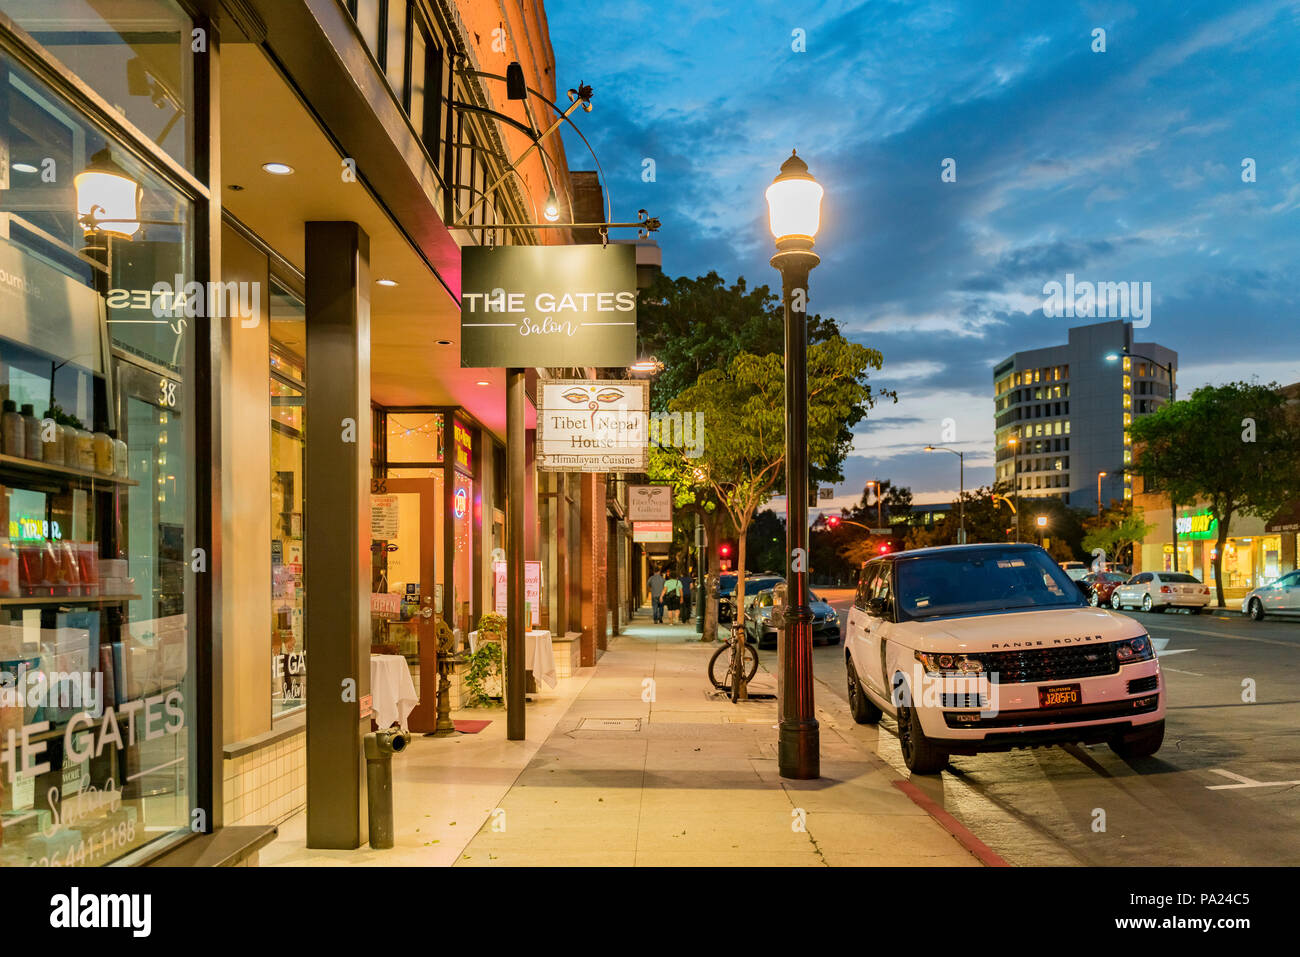 Pasadena, JUL 11: Beautiful night street view on JUL 11, 2018 at Pasadena, Los Angeles County, California - Stock Image